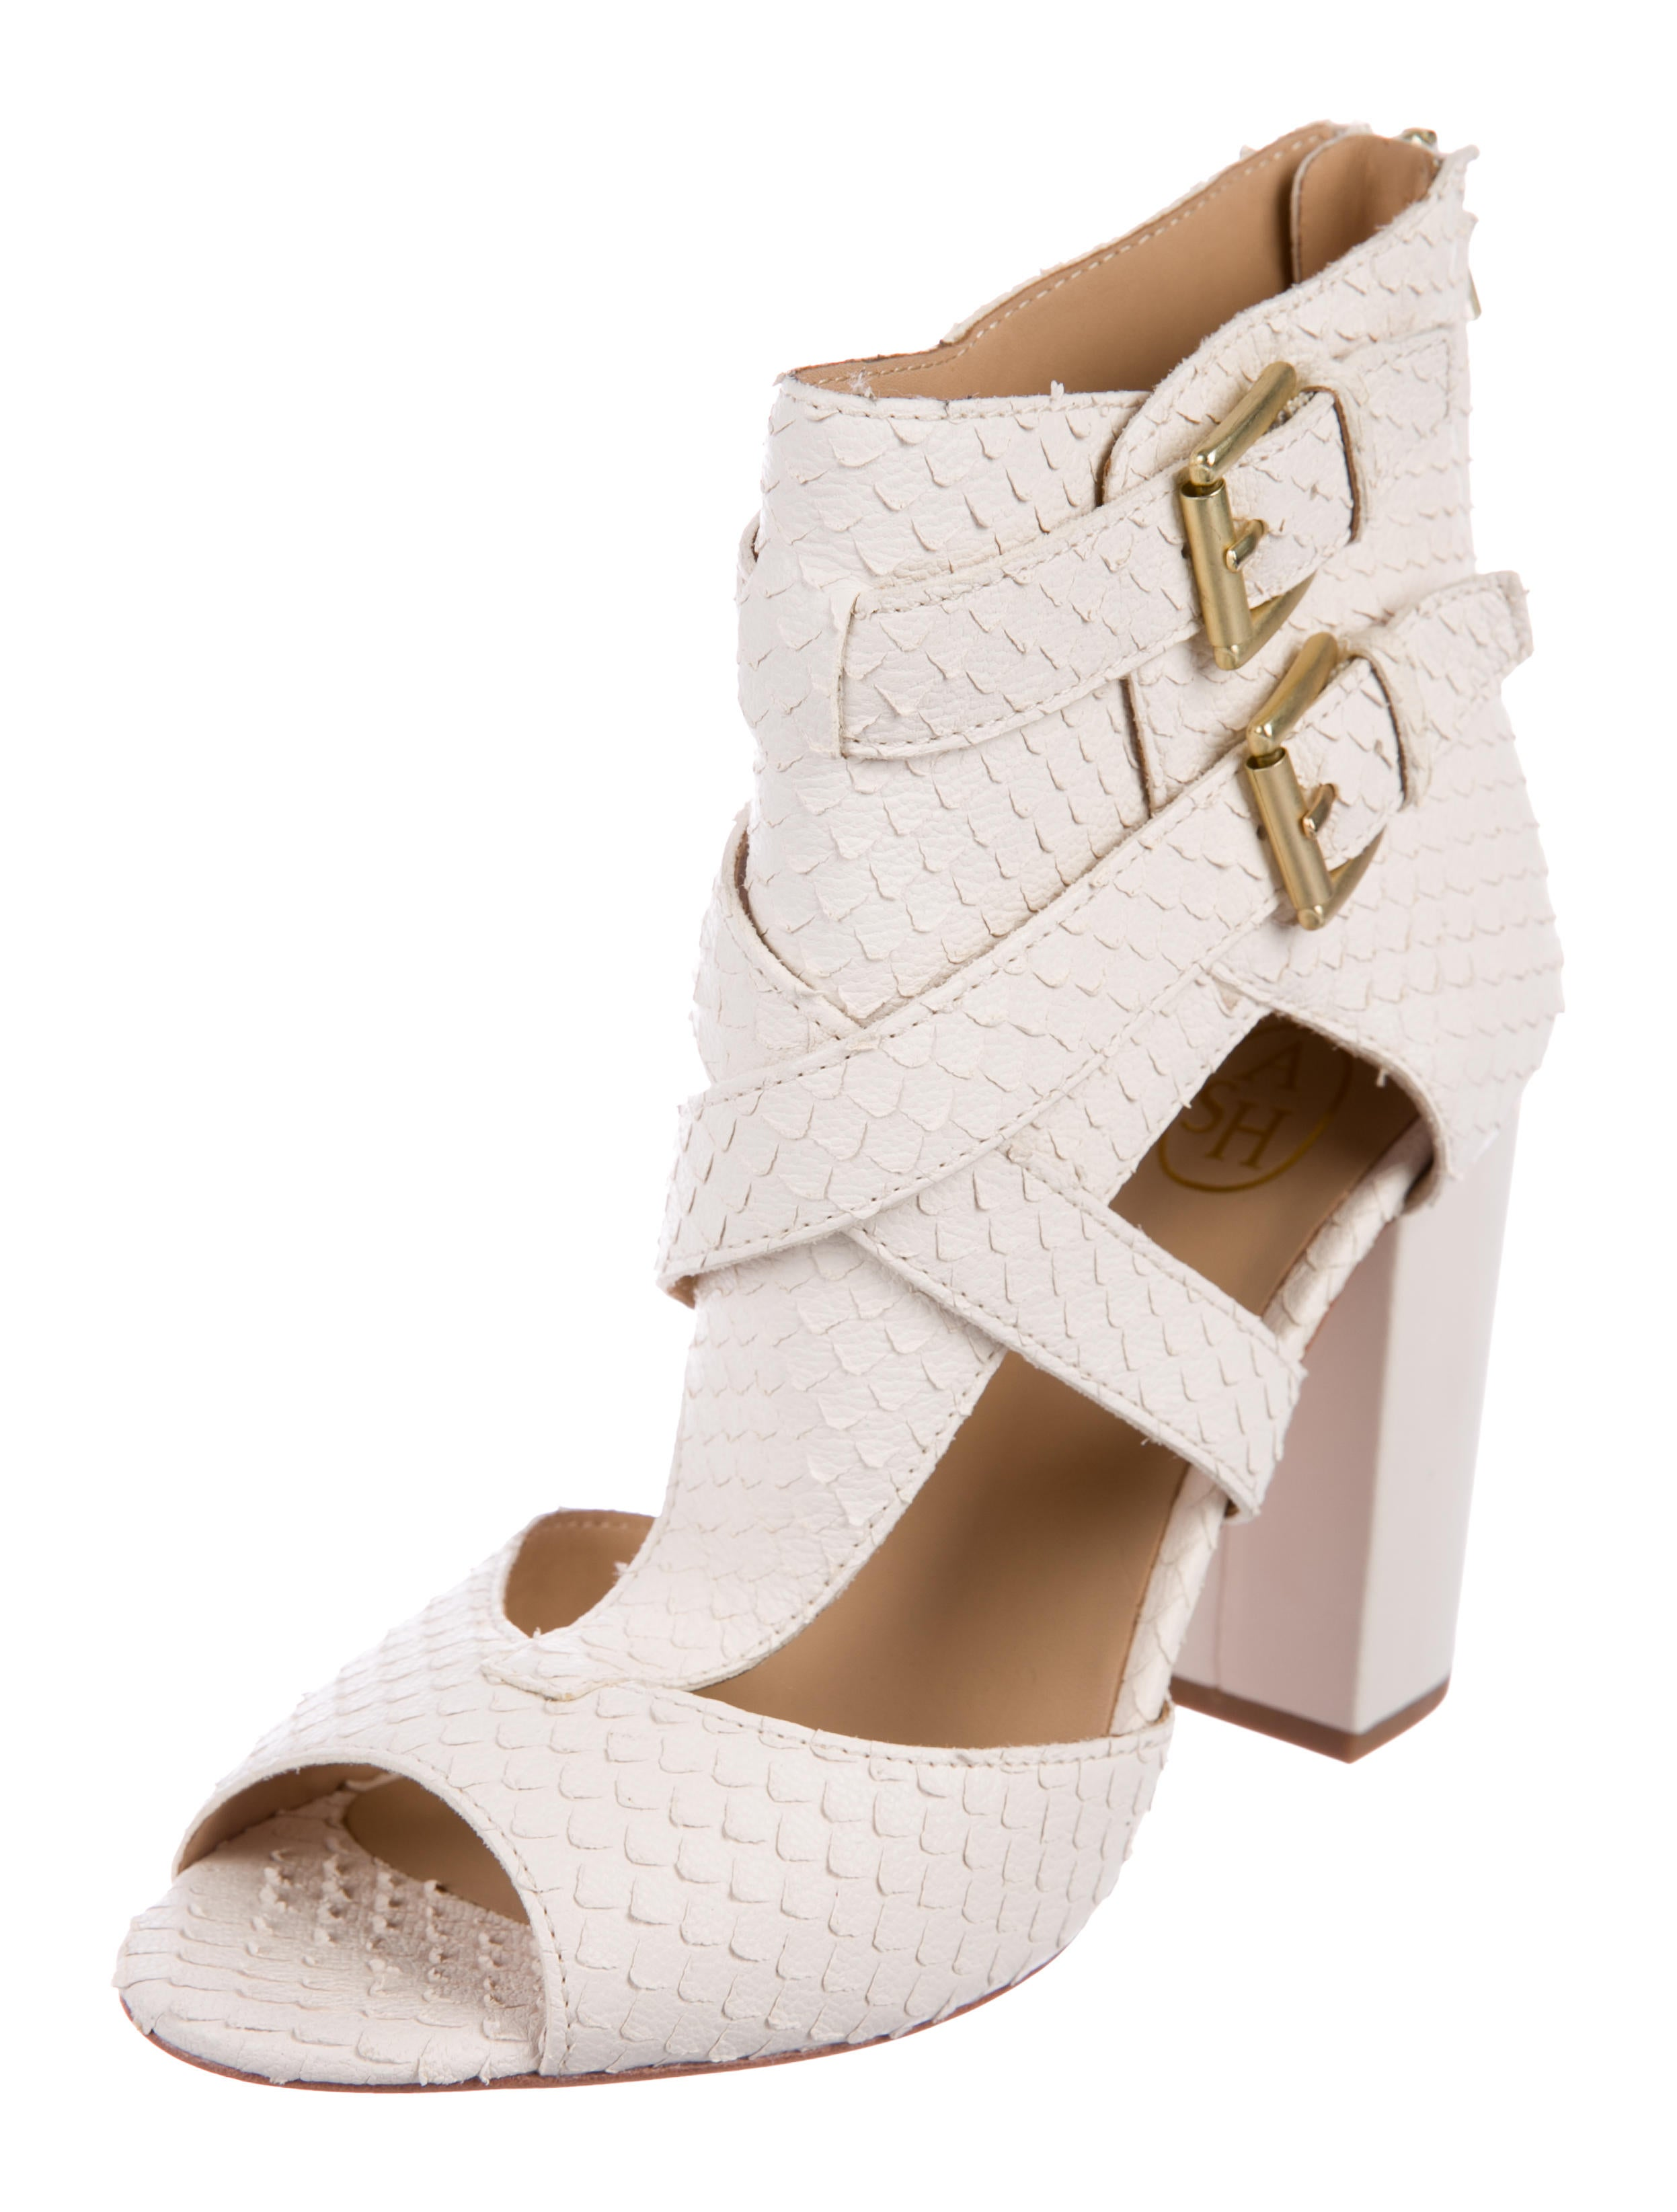 Ash Snakeskin Cage Sandals under 70 dollars p03lQe